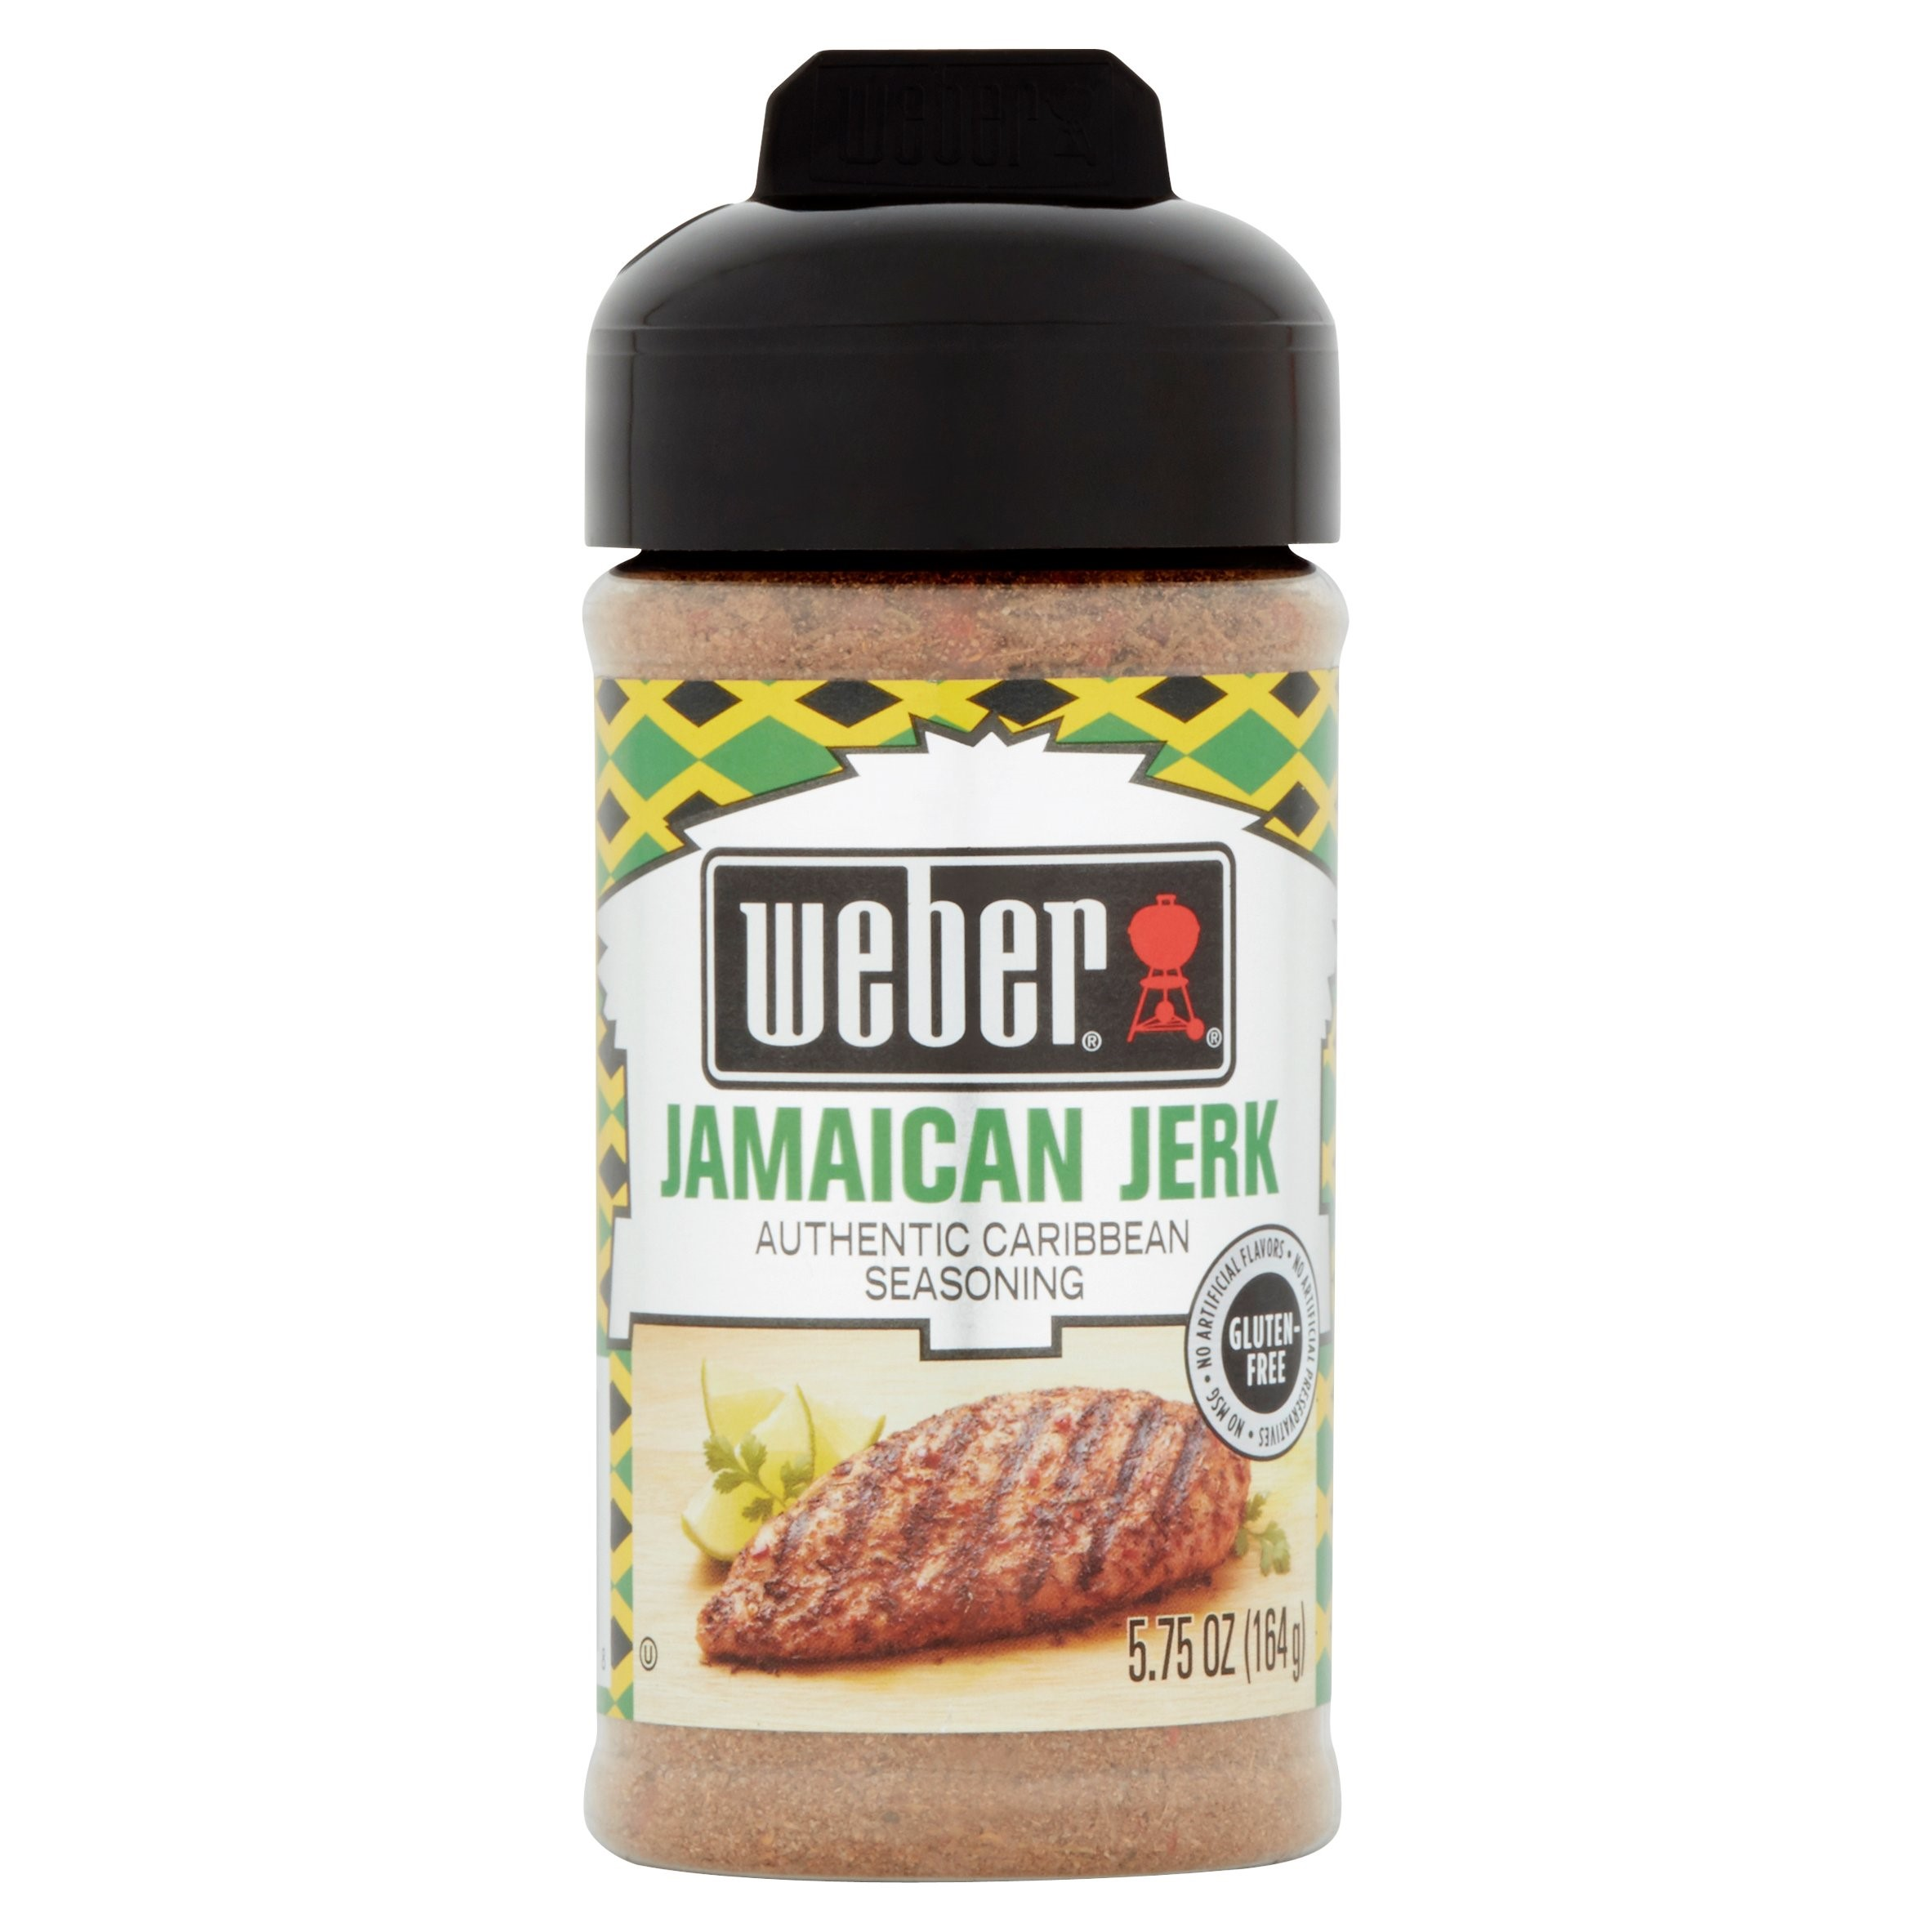 Weber Jamaican Jerk Authentic Caribbean Seasoning, 5.75 oz - Walmart.com